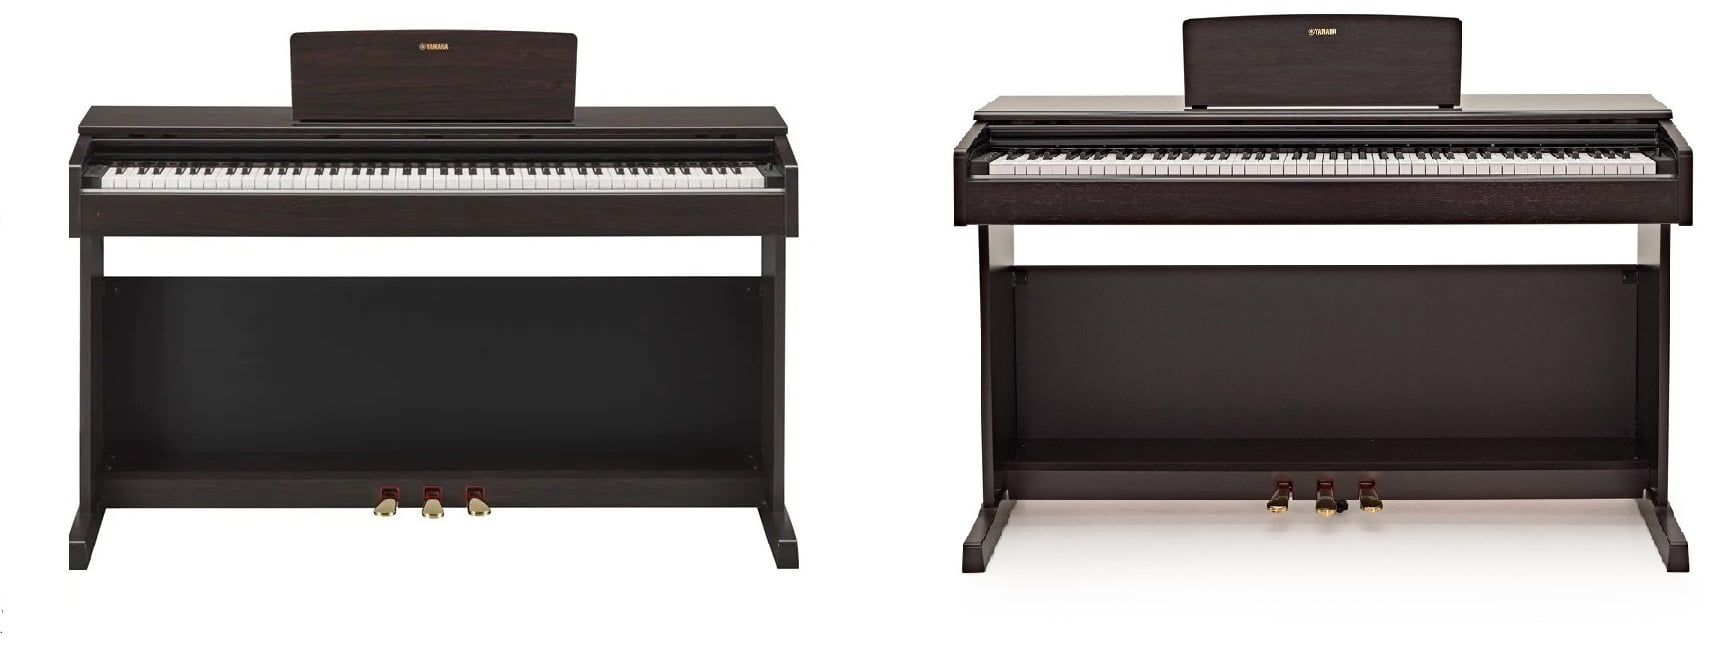 YDP-143-و-YDP-144-Yamaha